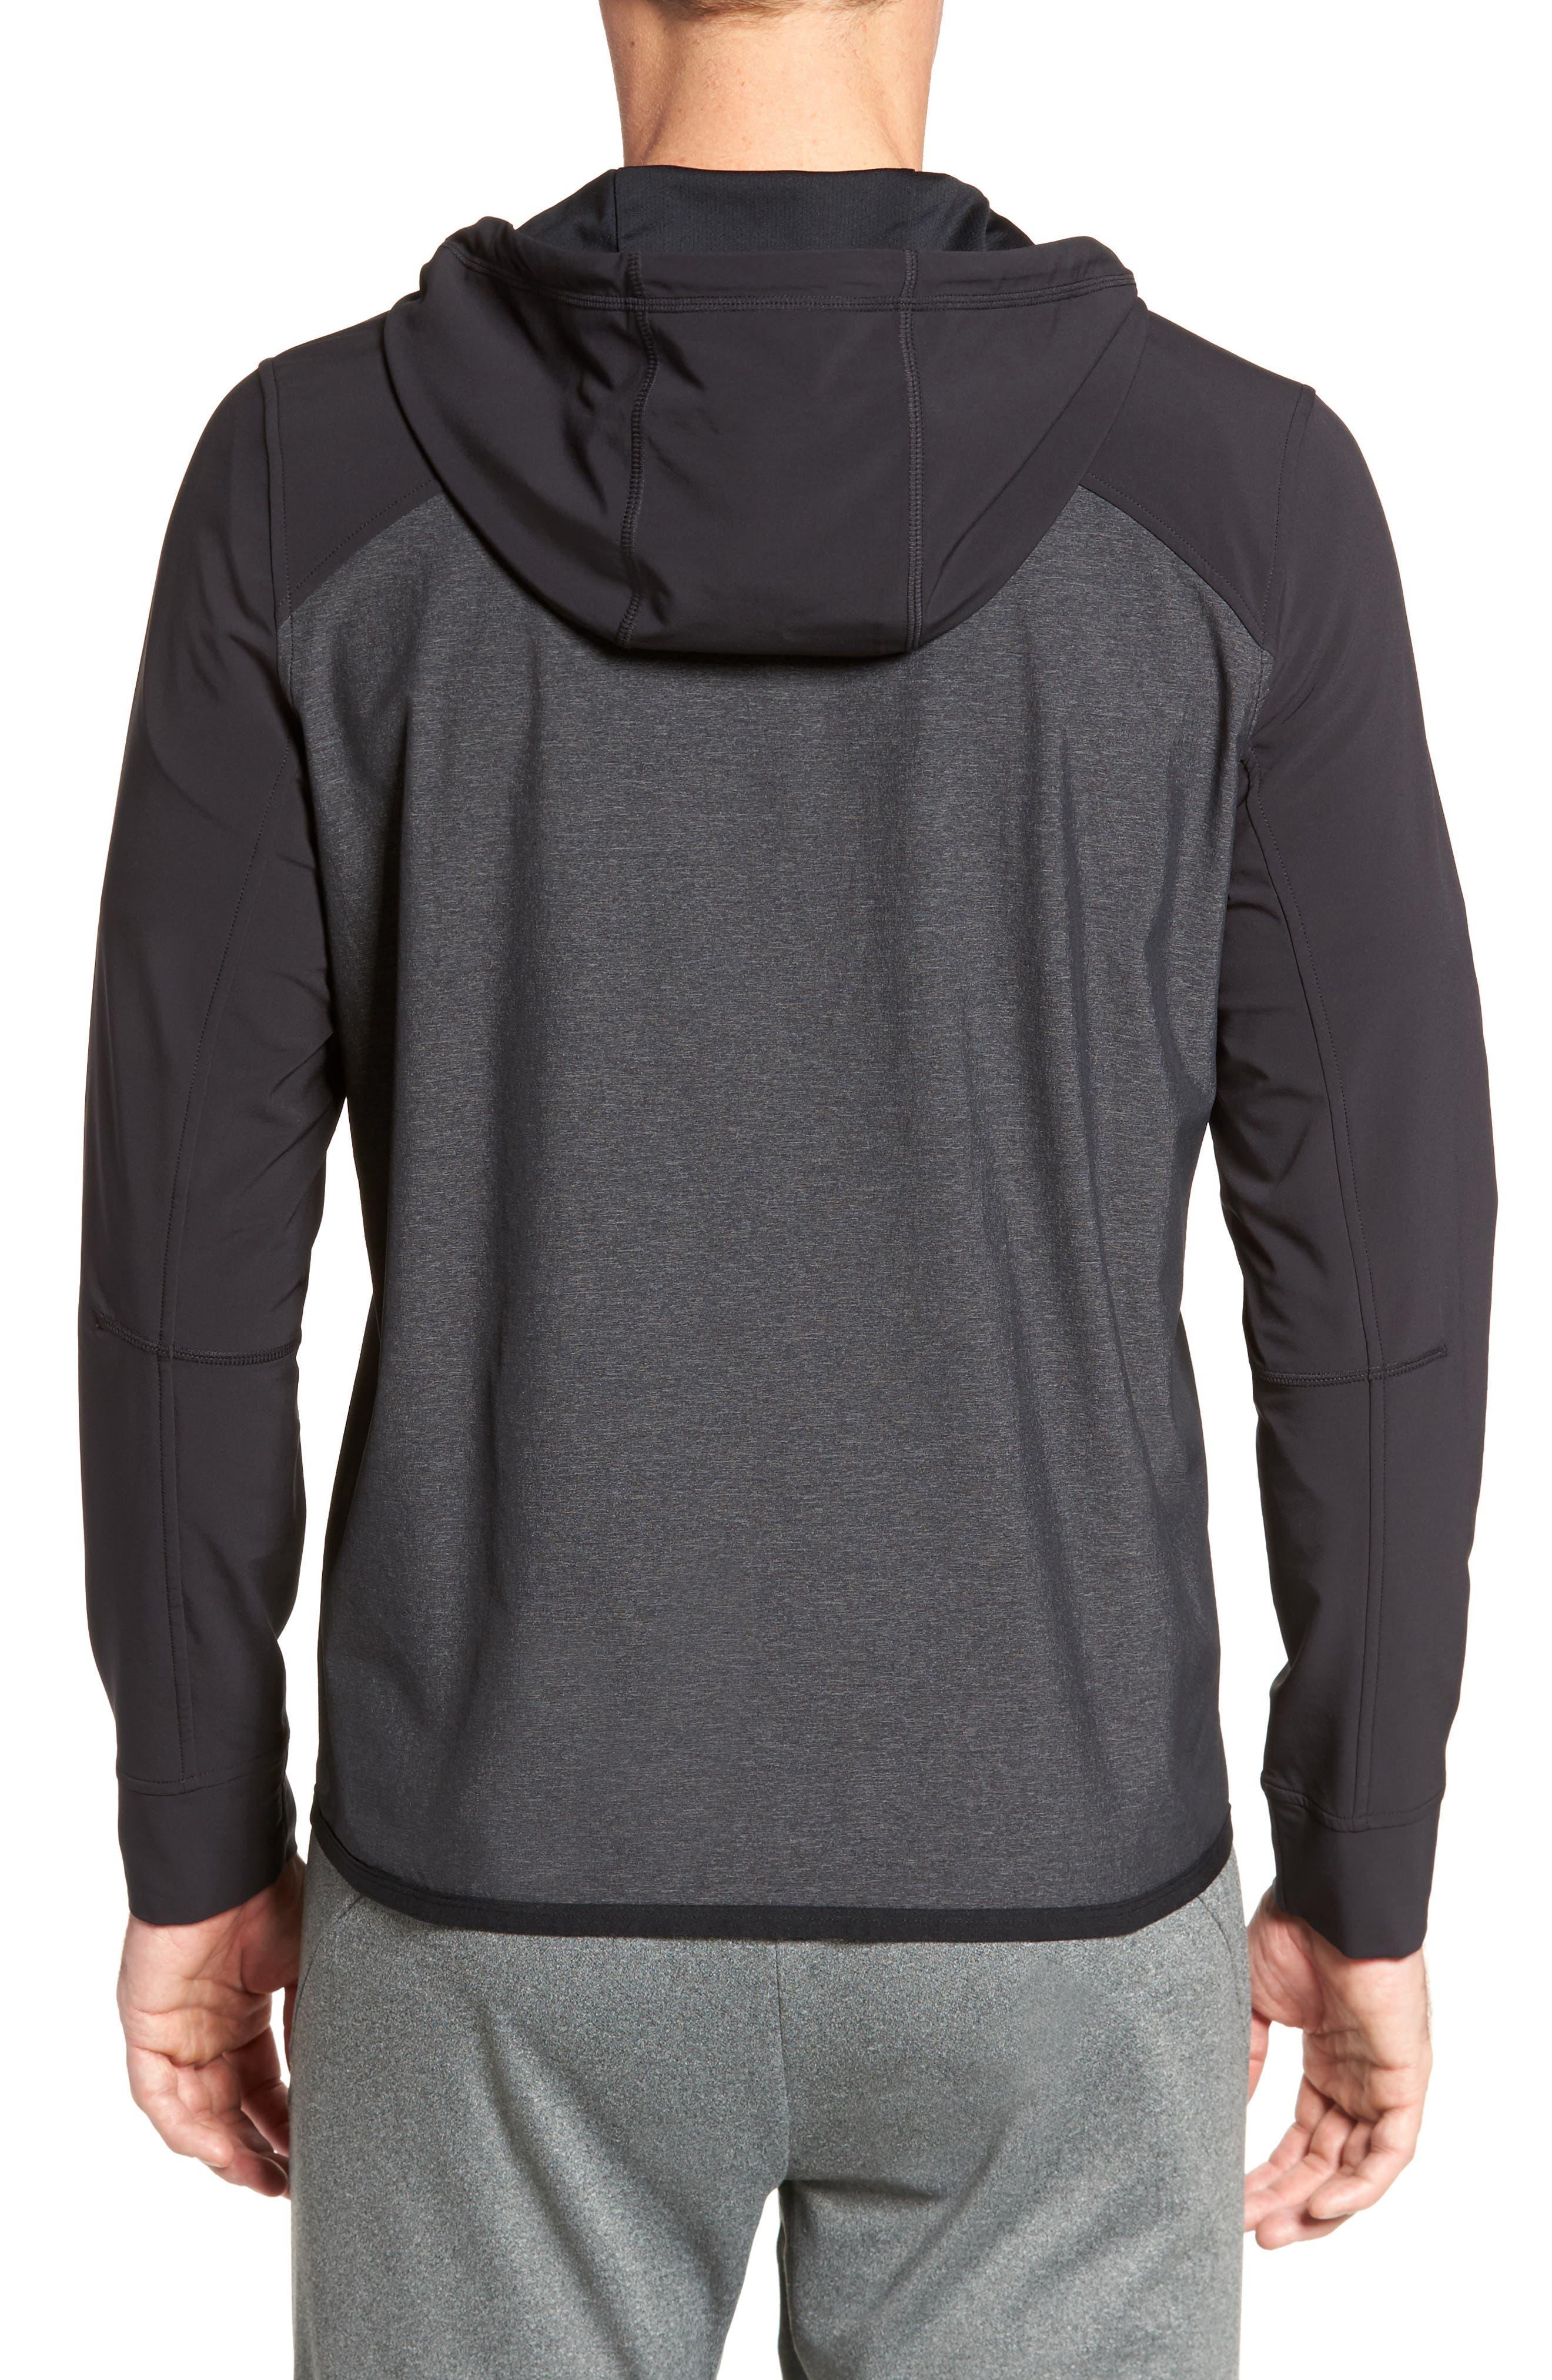 Knit & Woven Hoodie,                             Alternate thumbnail 2, color,                             Grey Ebony - Black